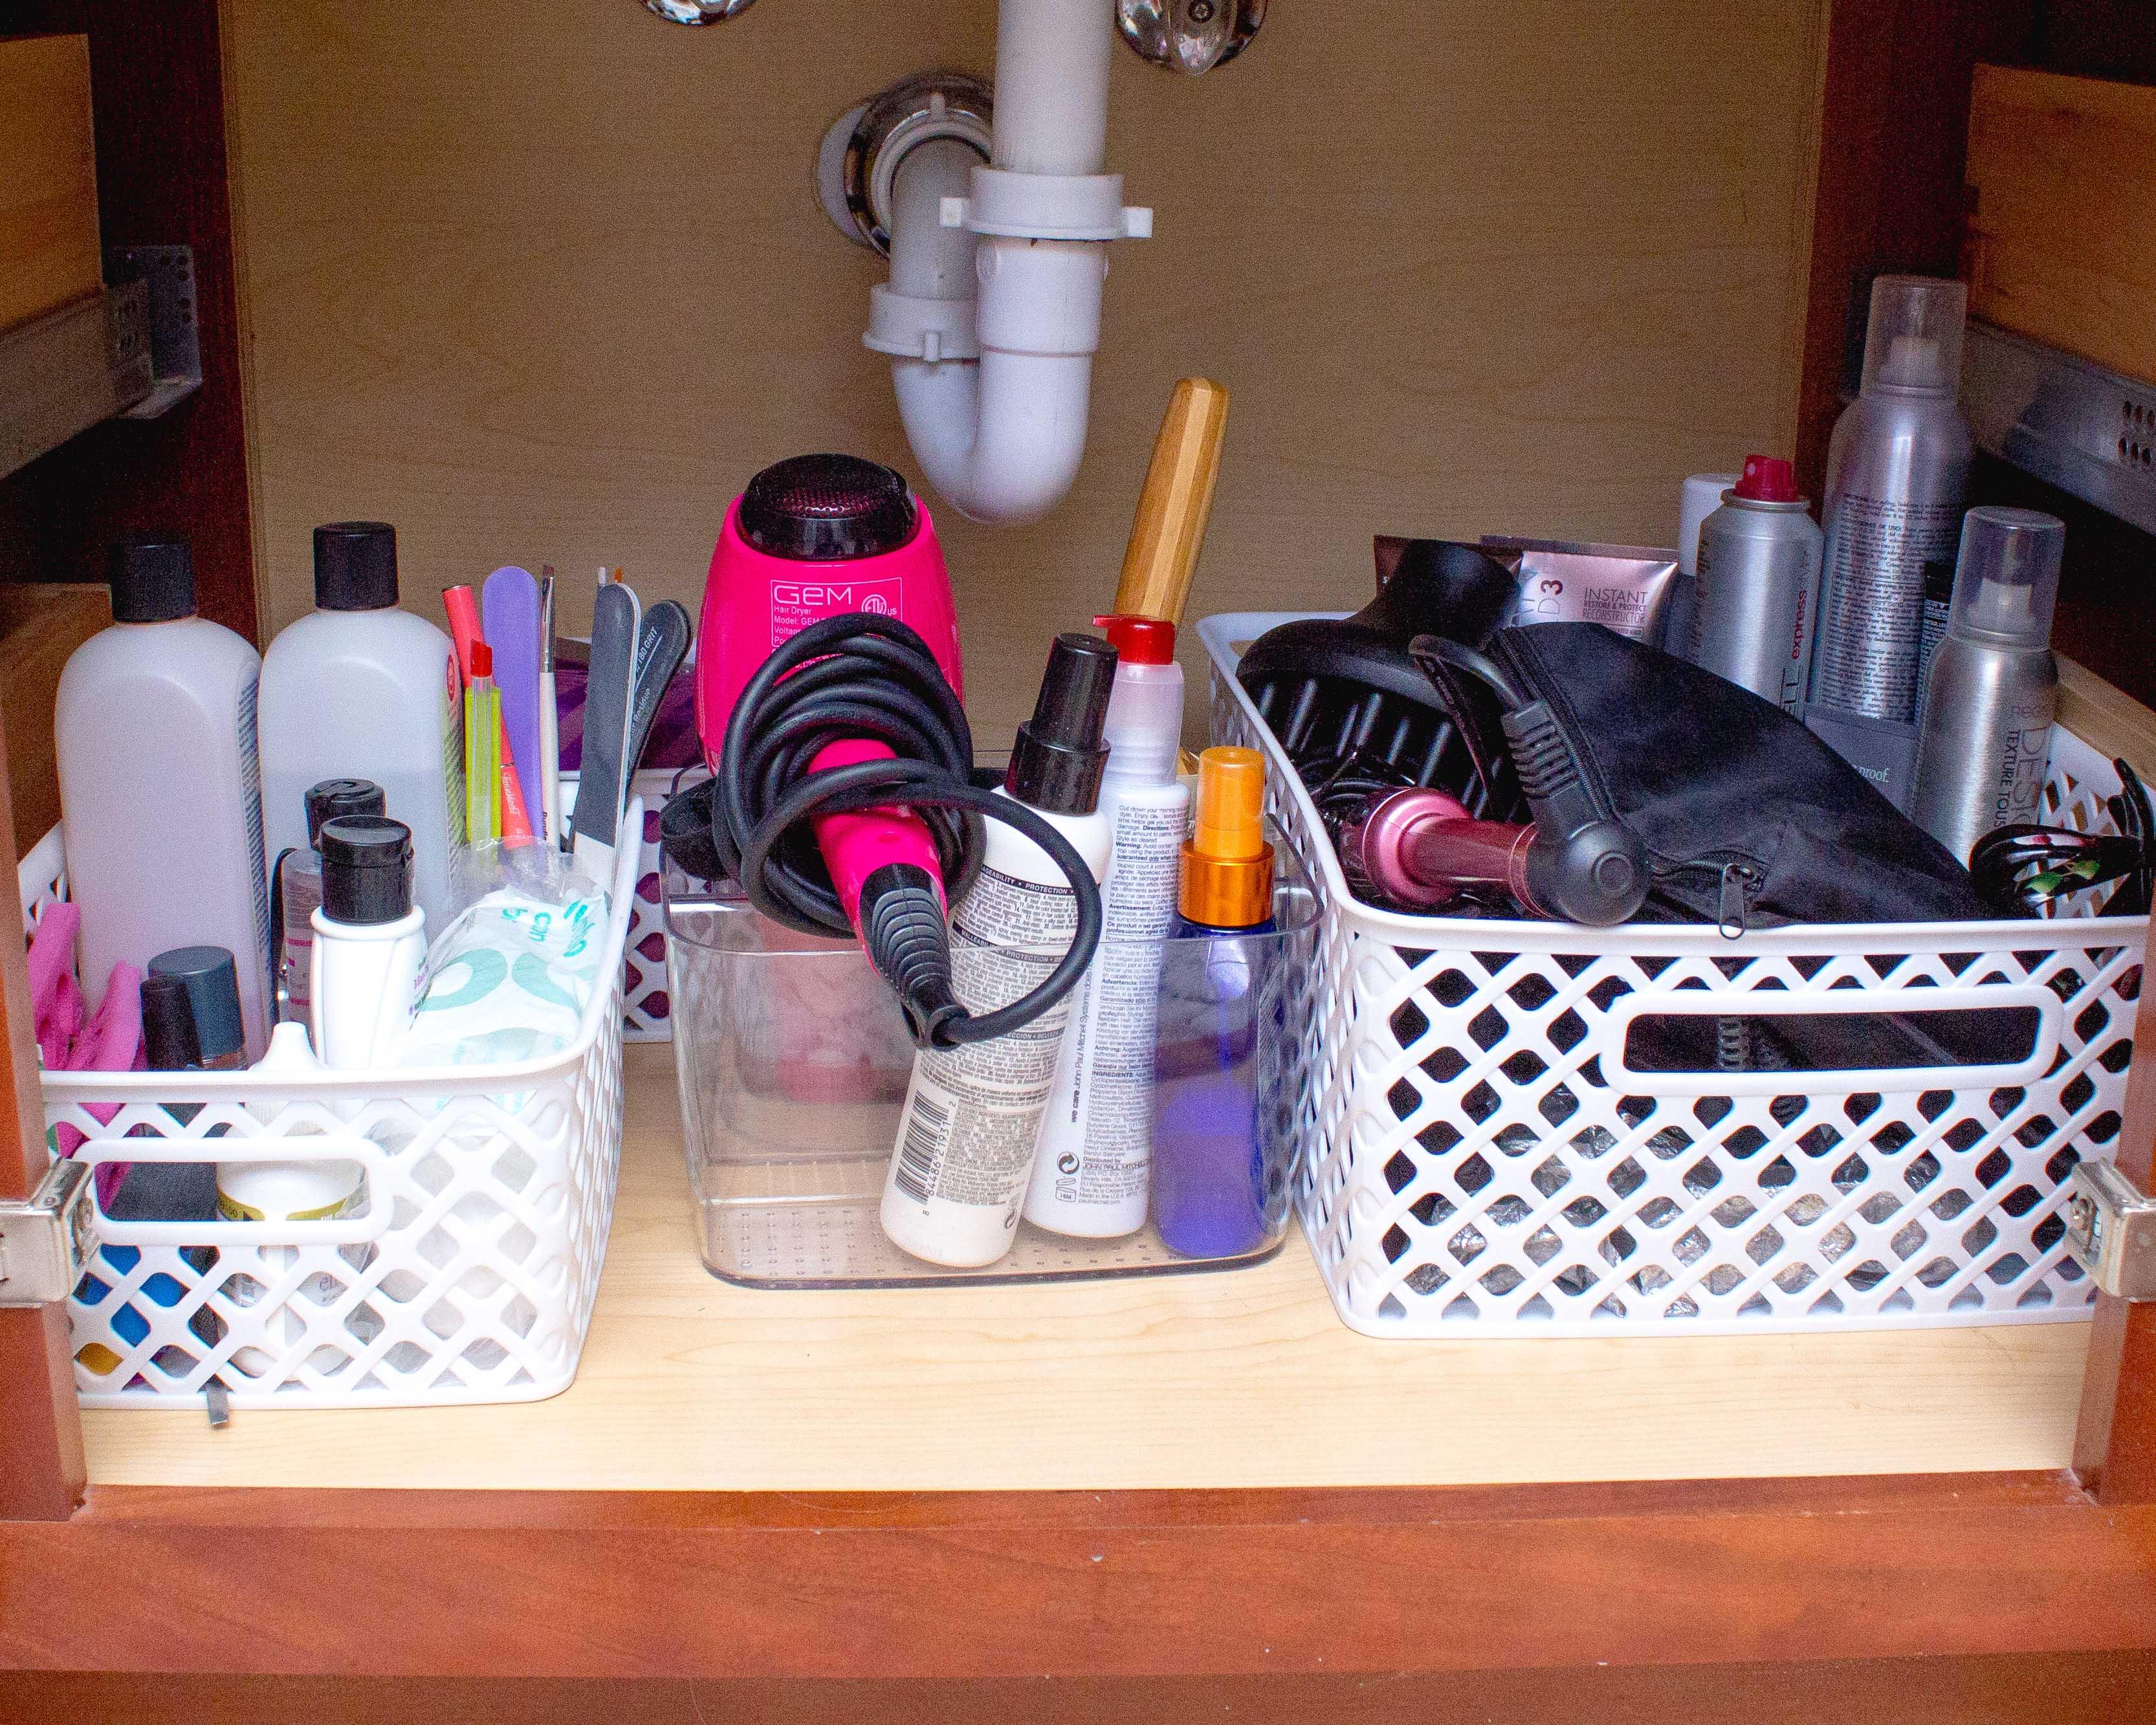 5 TIPS FOR BATHROOM ORGANIZATION